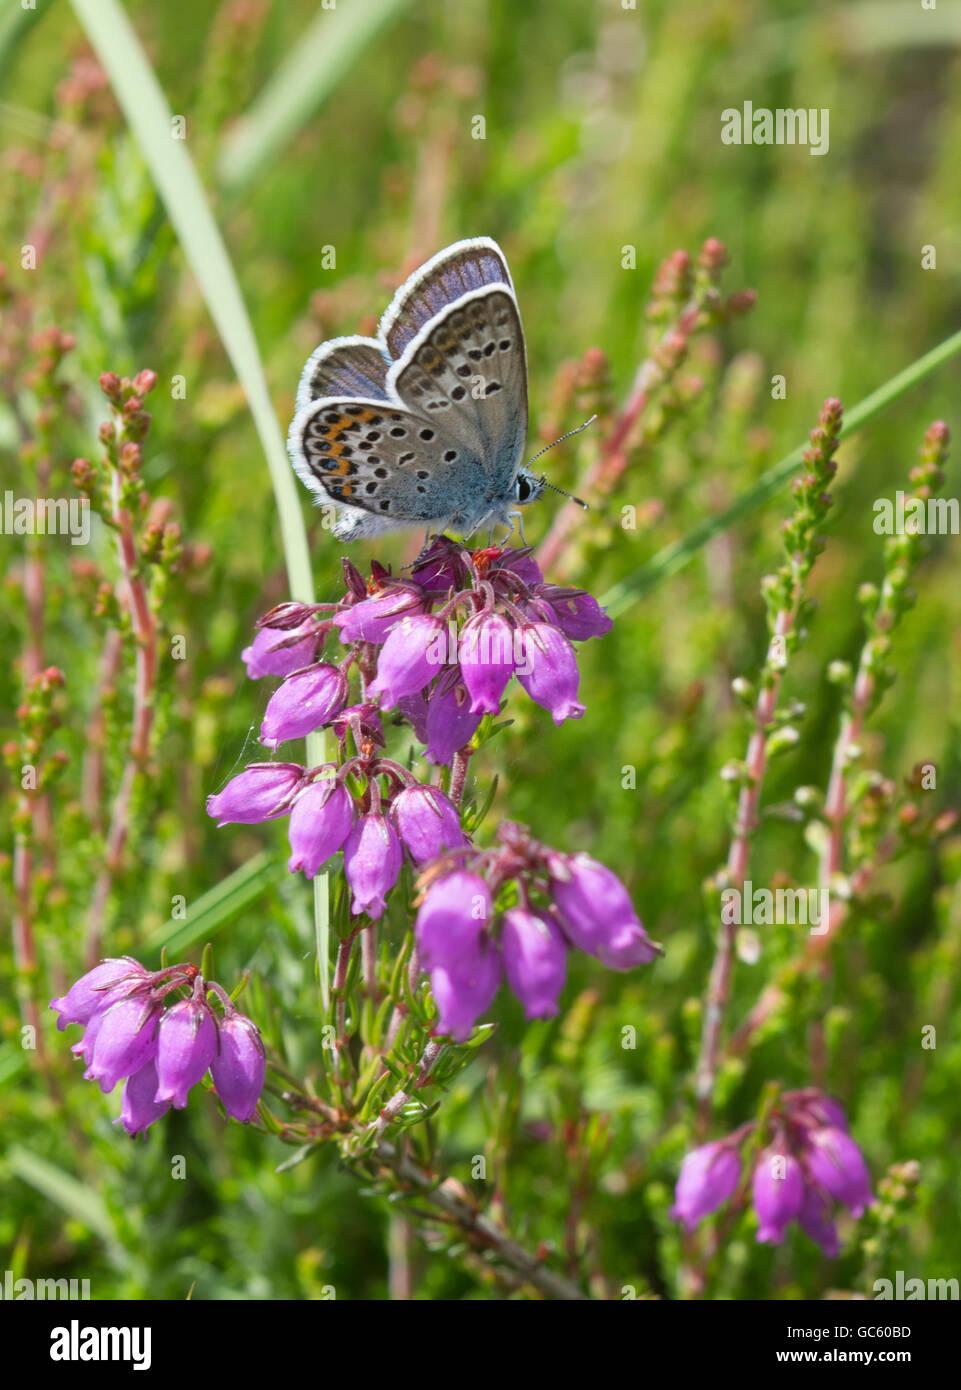 silver-studded-blue-butterfly-plebejus-argus-in-surrey-heathland-england-GC60BD.jpg